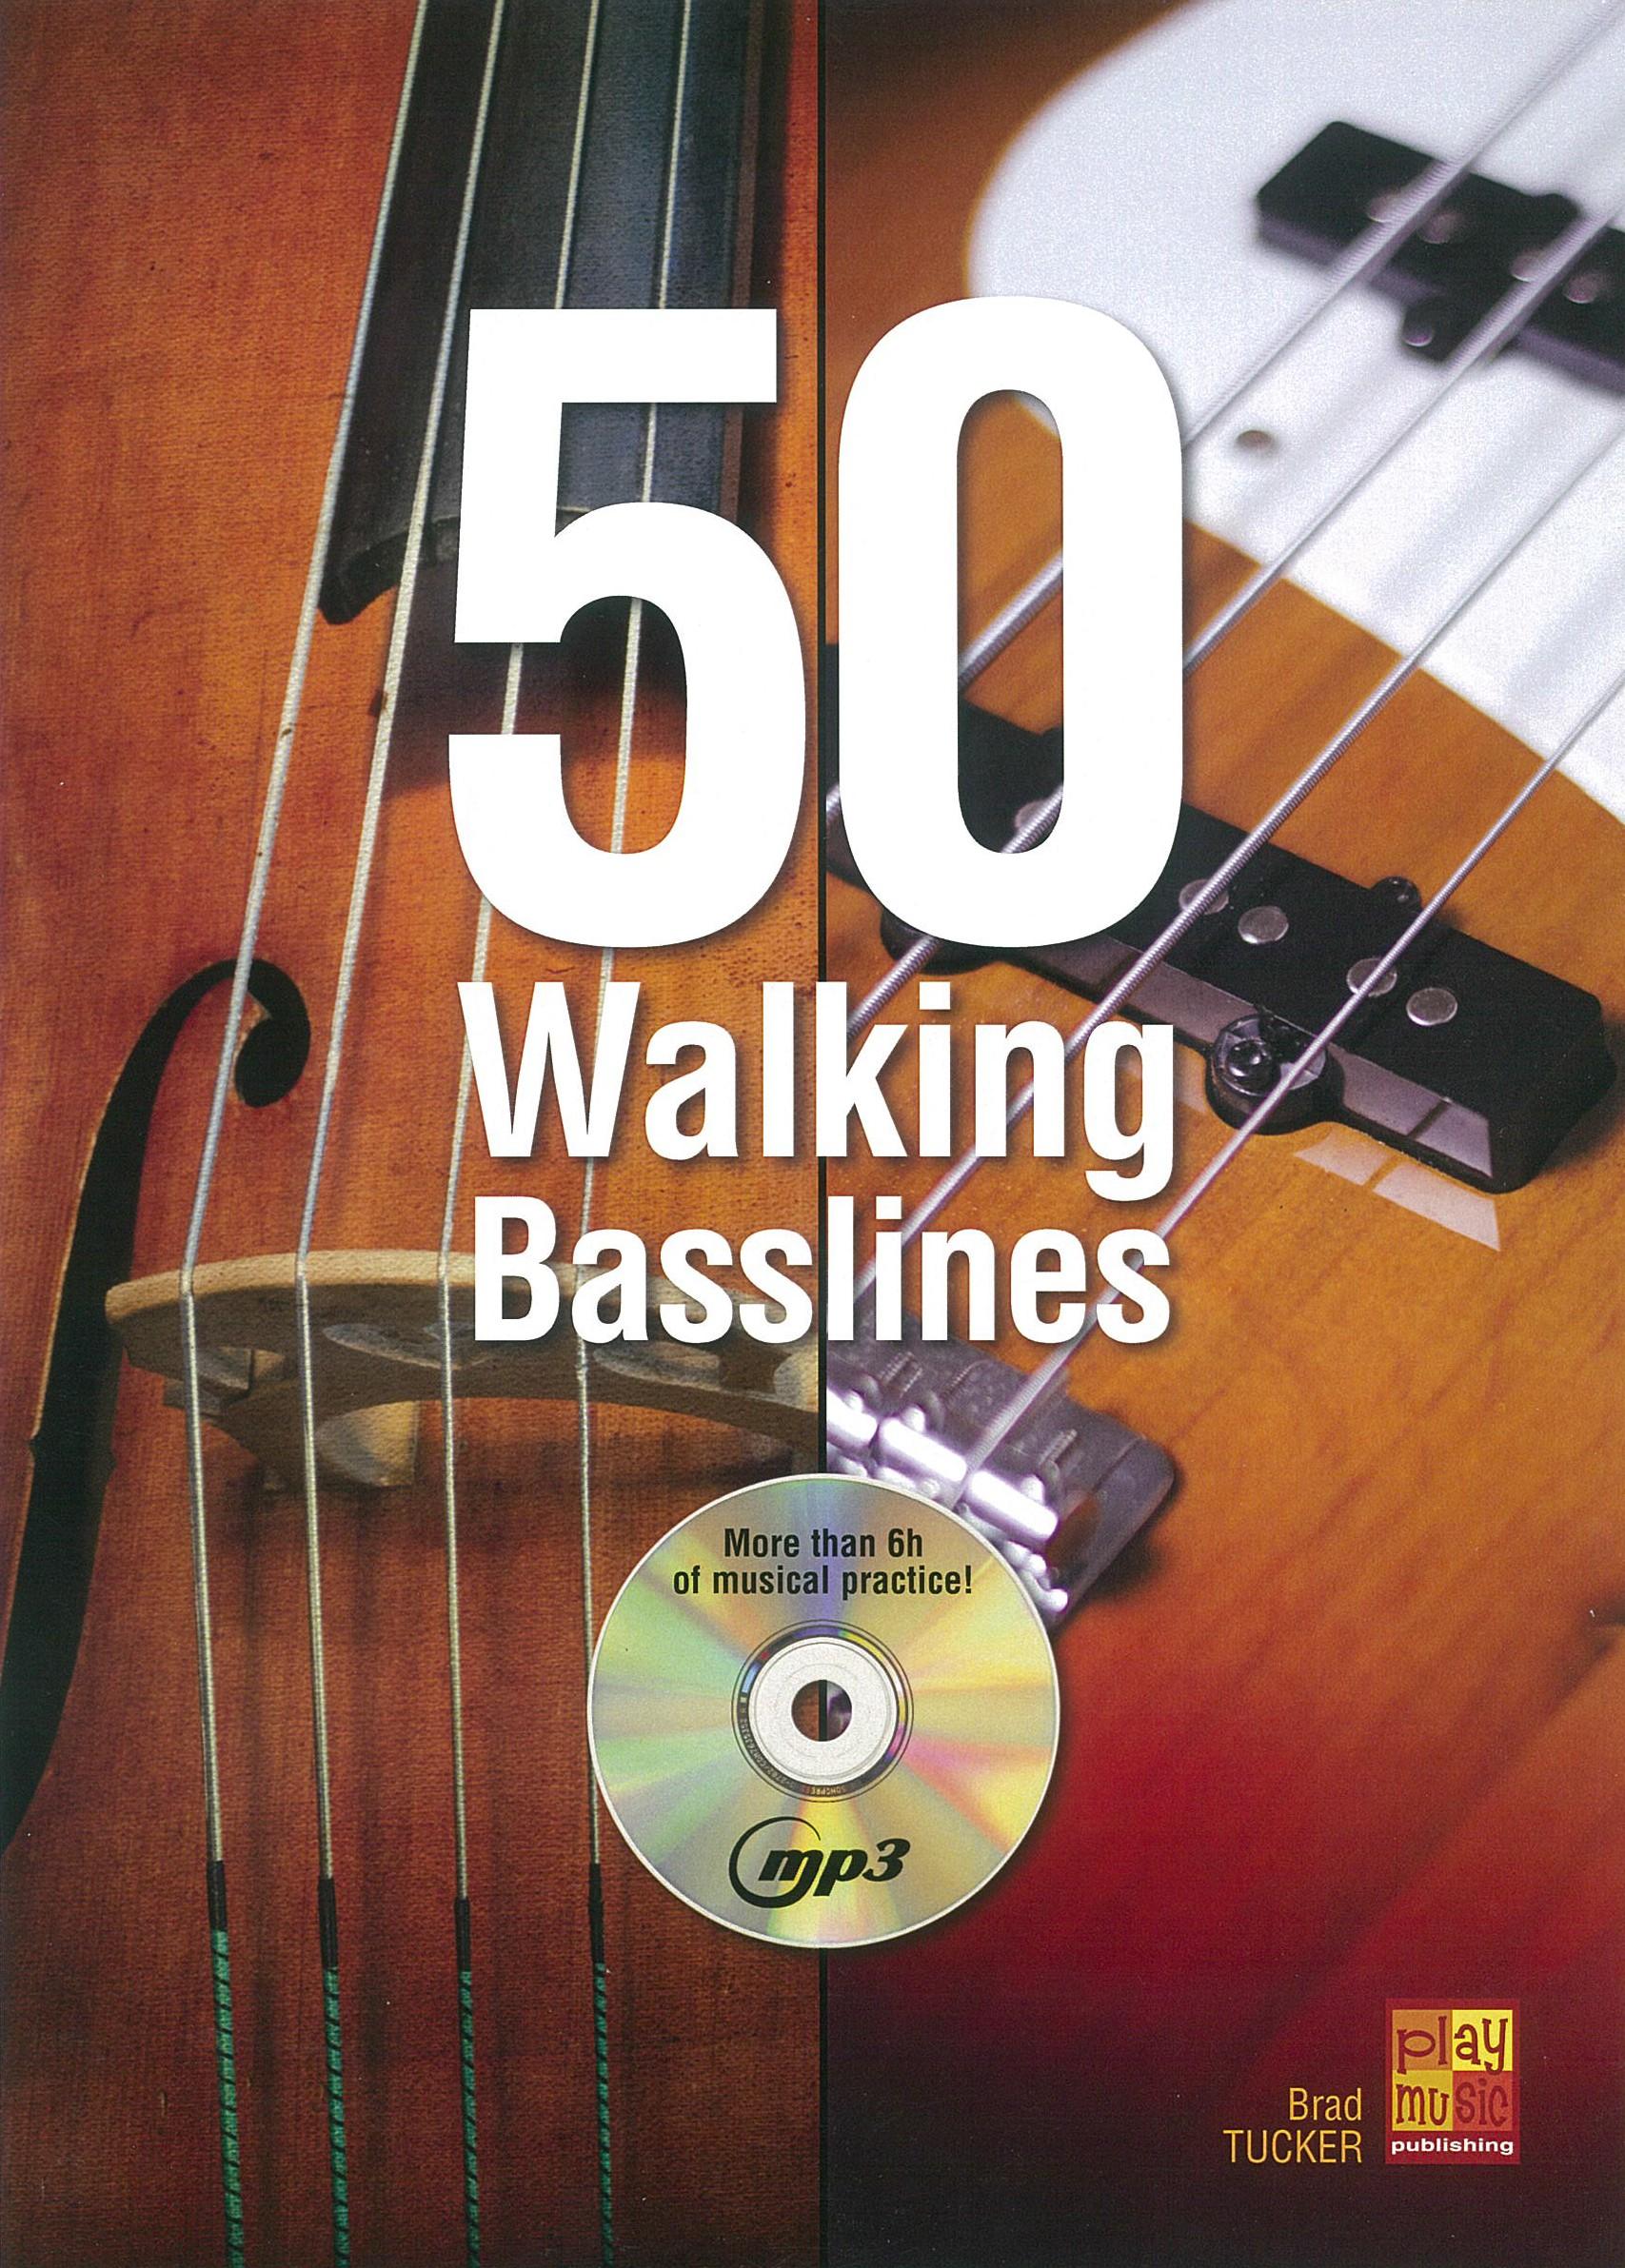 50 Walking Basslines (1 Book + 1 CD)